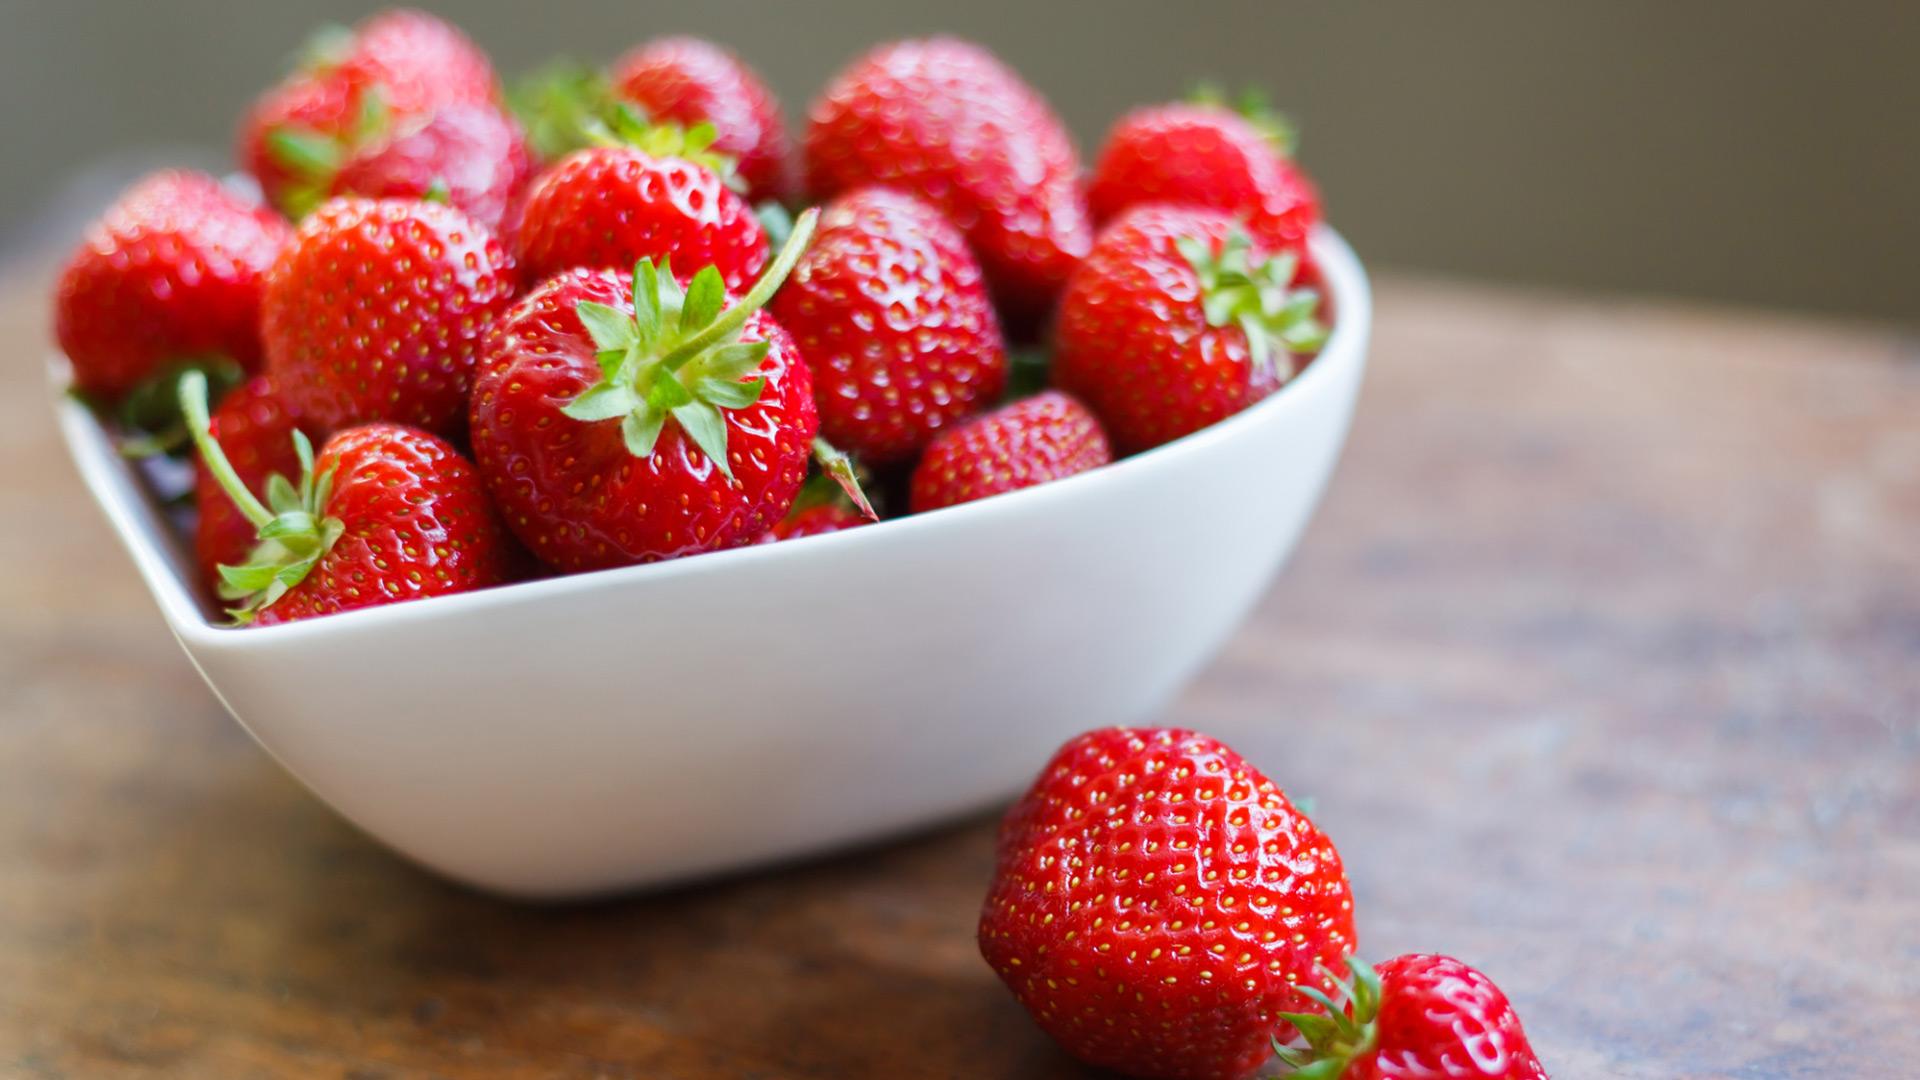 Strawberries | Sheknows.com